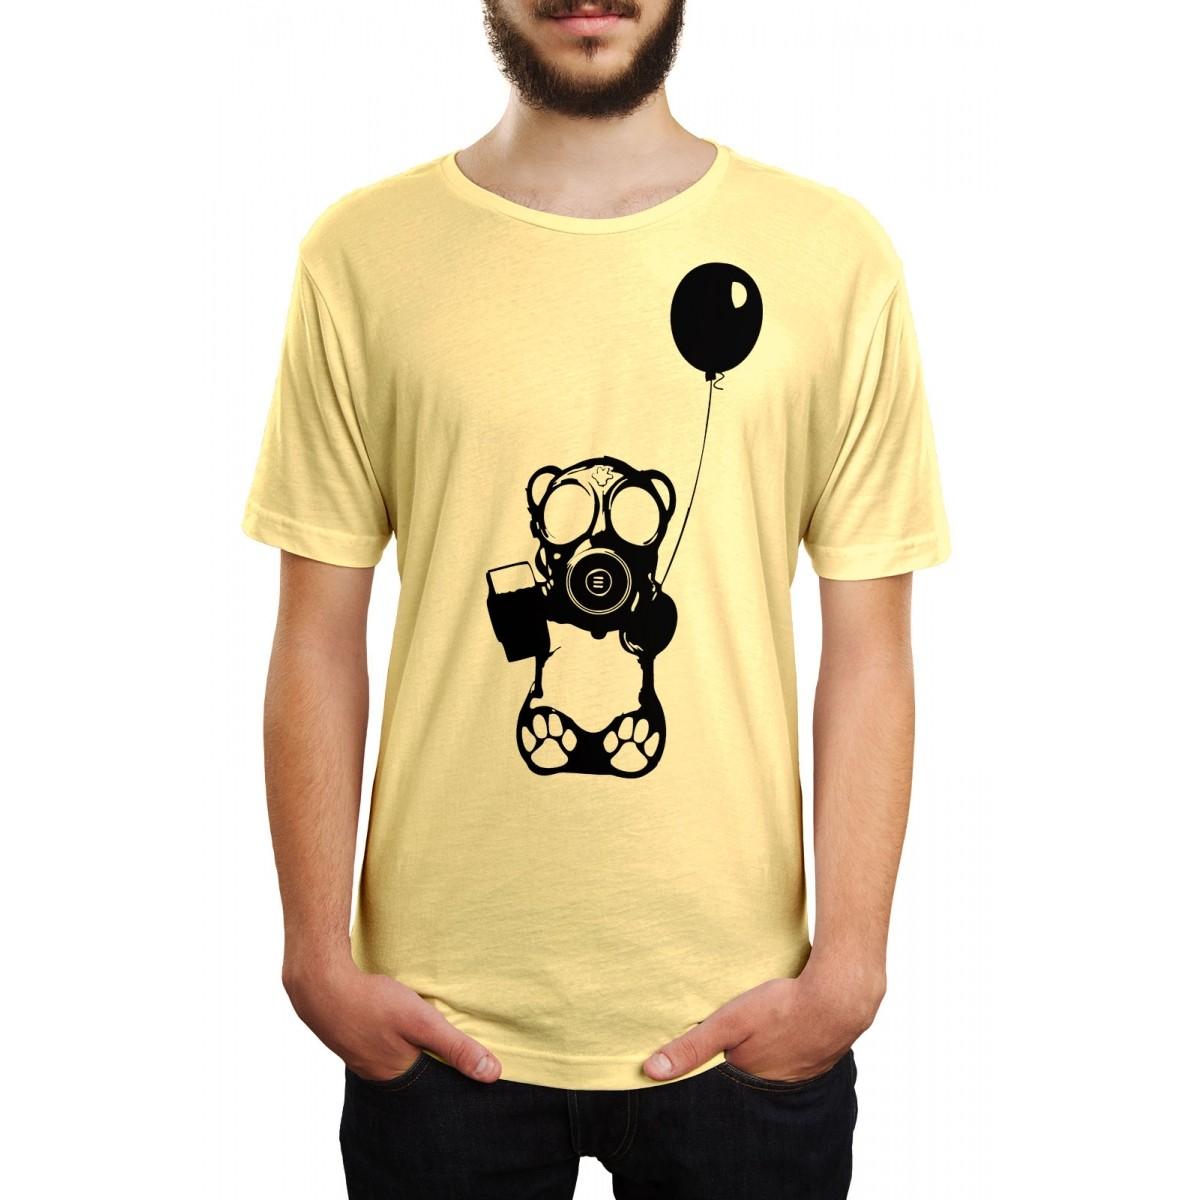 Camiseta HShop Bear Balloon Amarela  - HShop